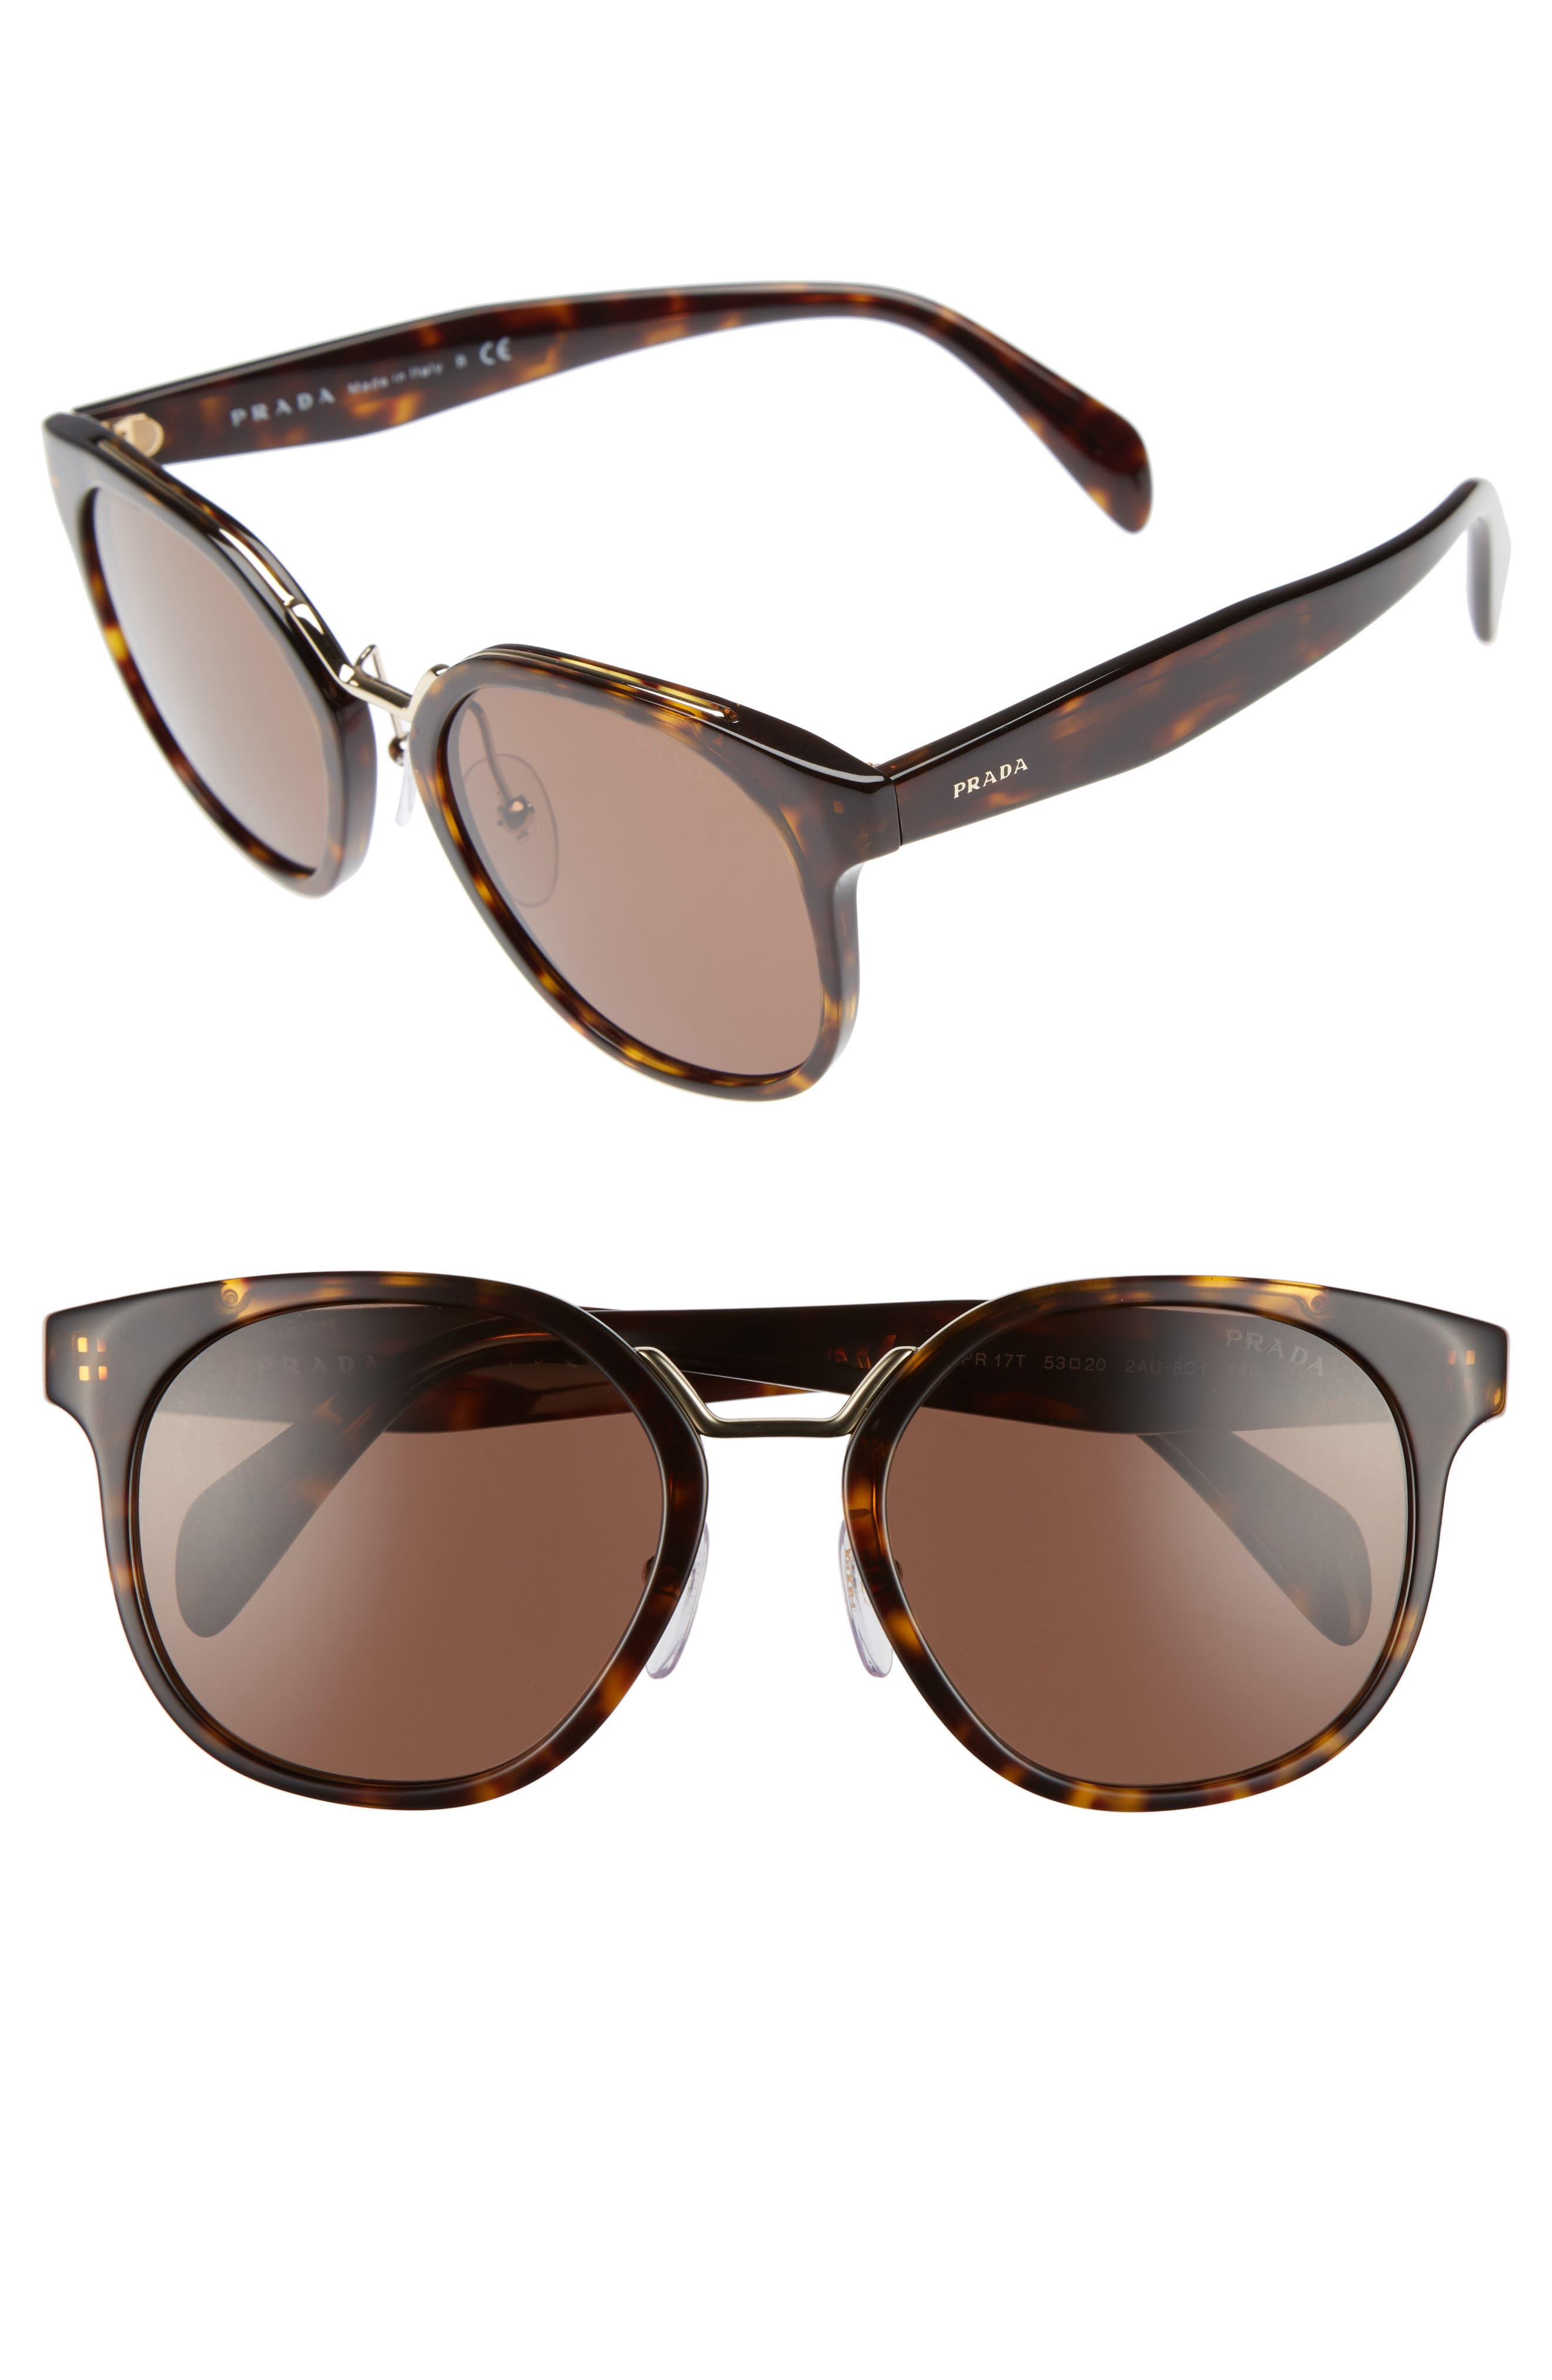 53mm Horn-Rimmed Sunglasses,                         Main,                         color, Brown Havana